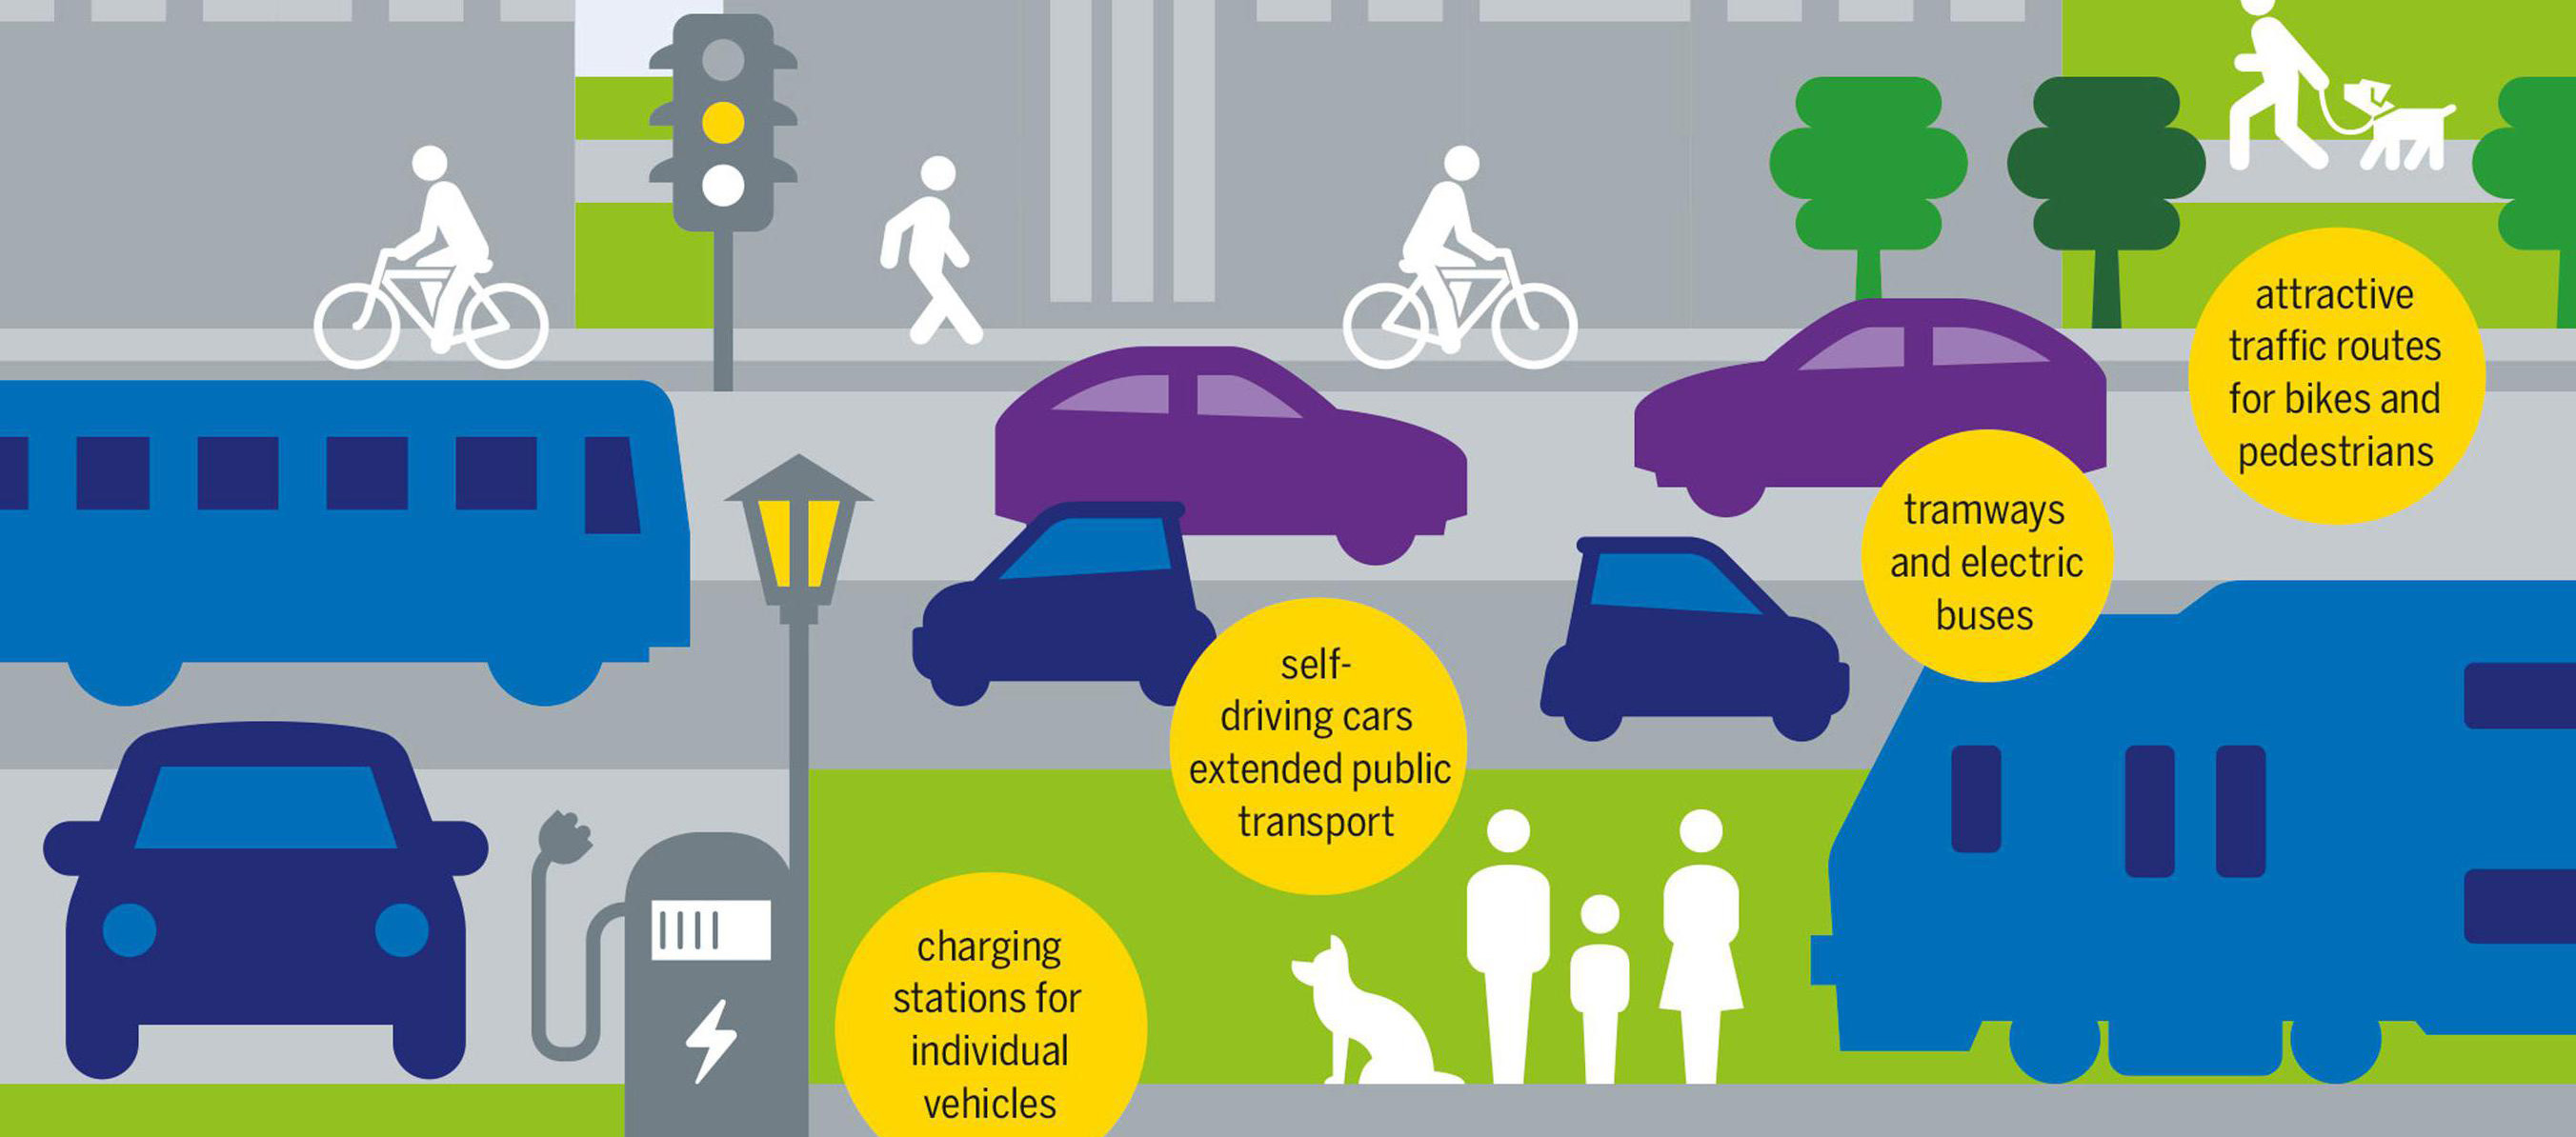 Mobilitätswende Image 1